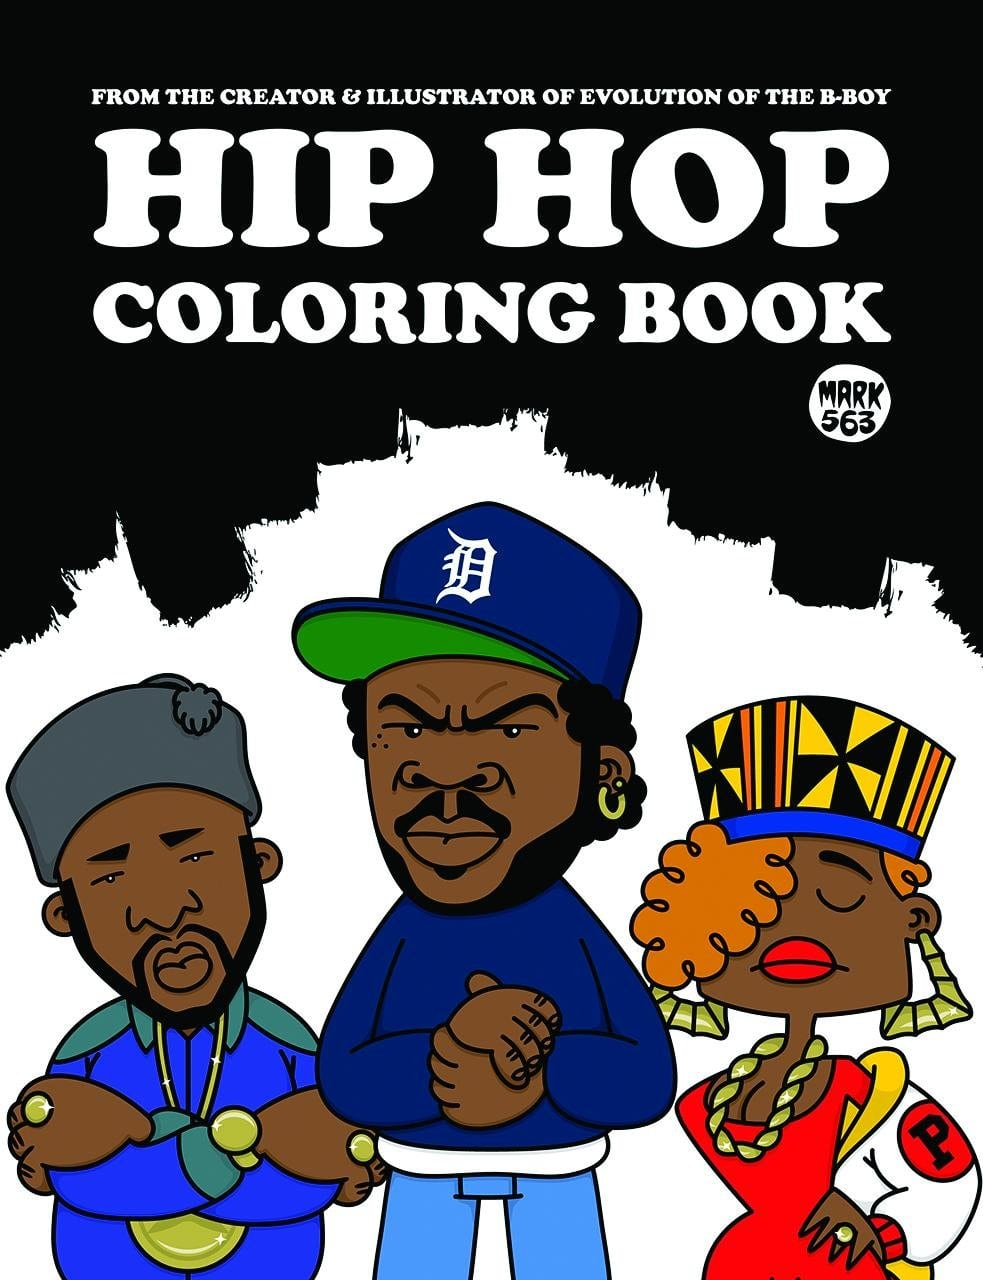 Hip Hop Coloring Book  Mark 563  9789185639830  Amazon Com  Books